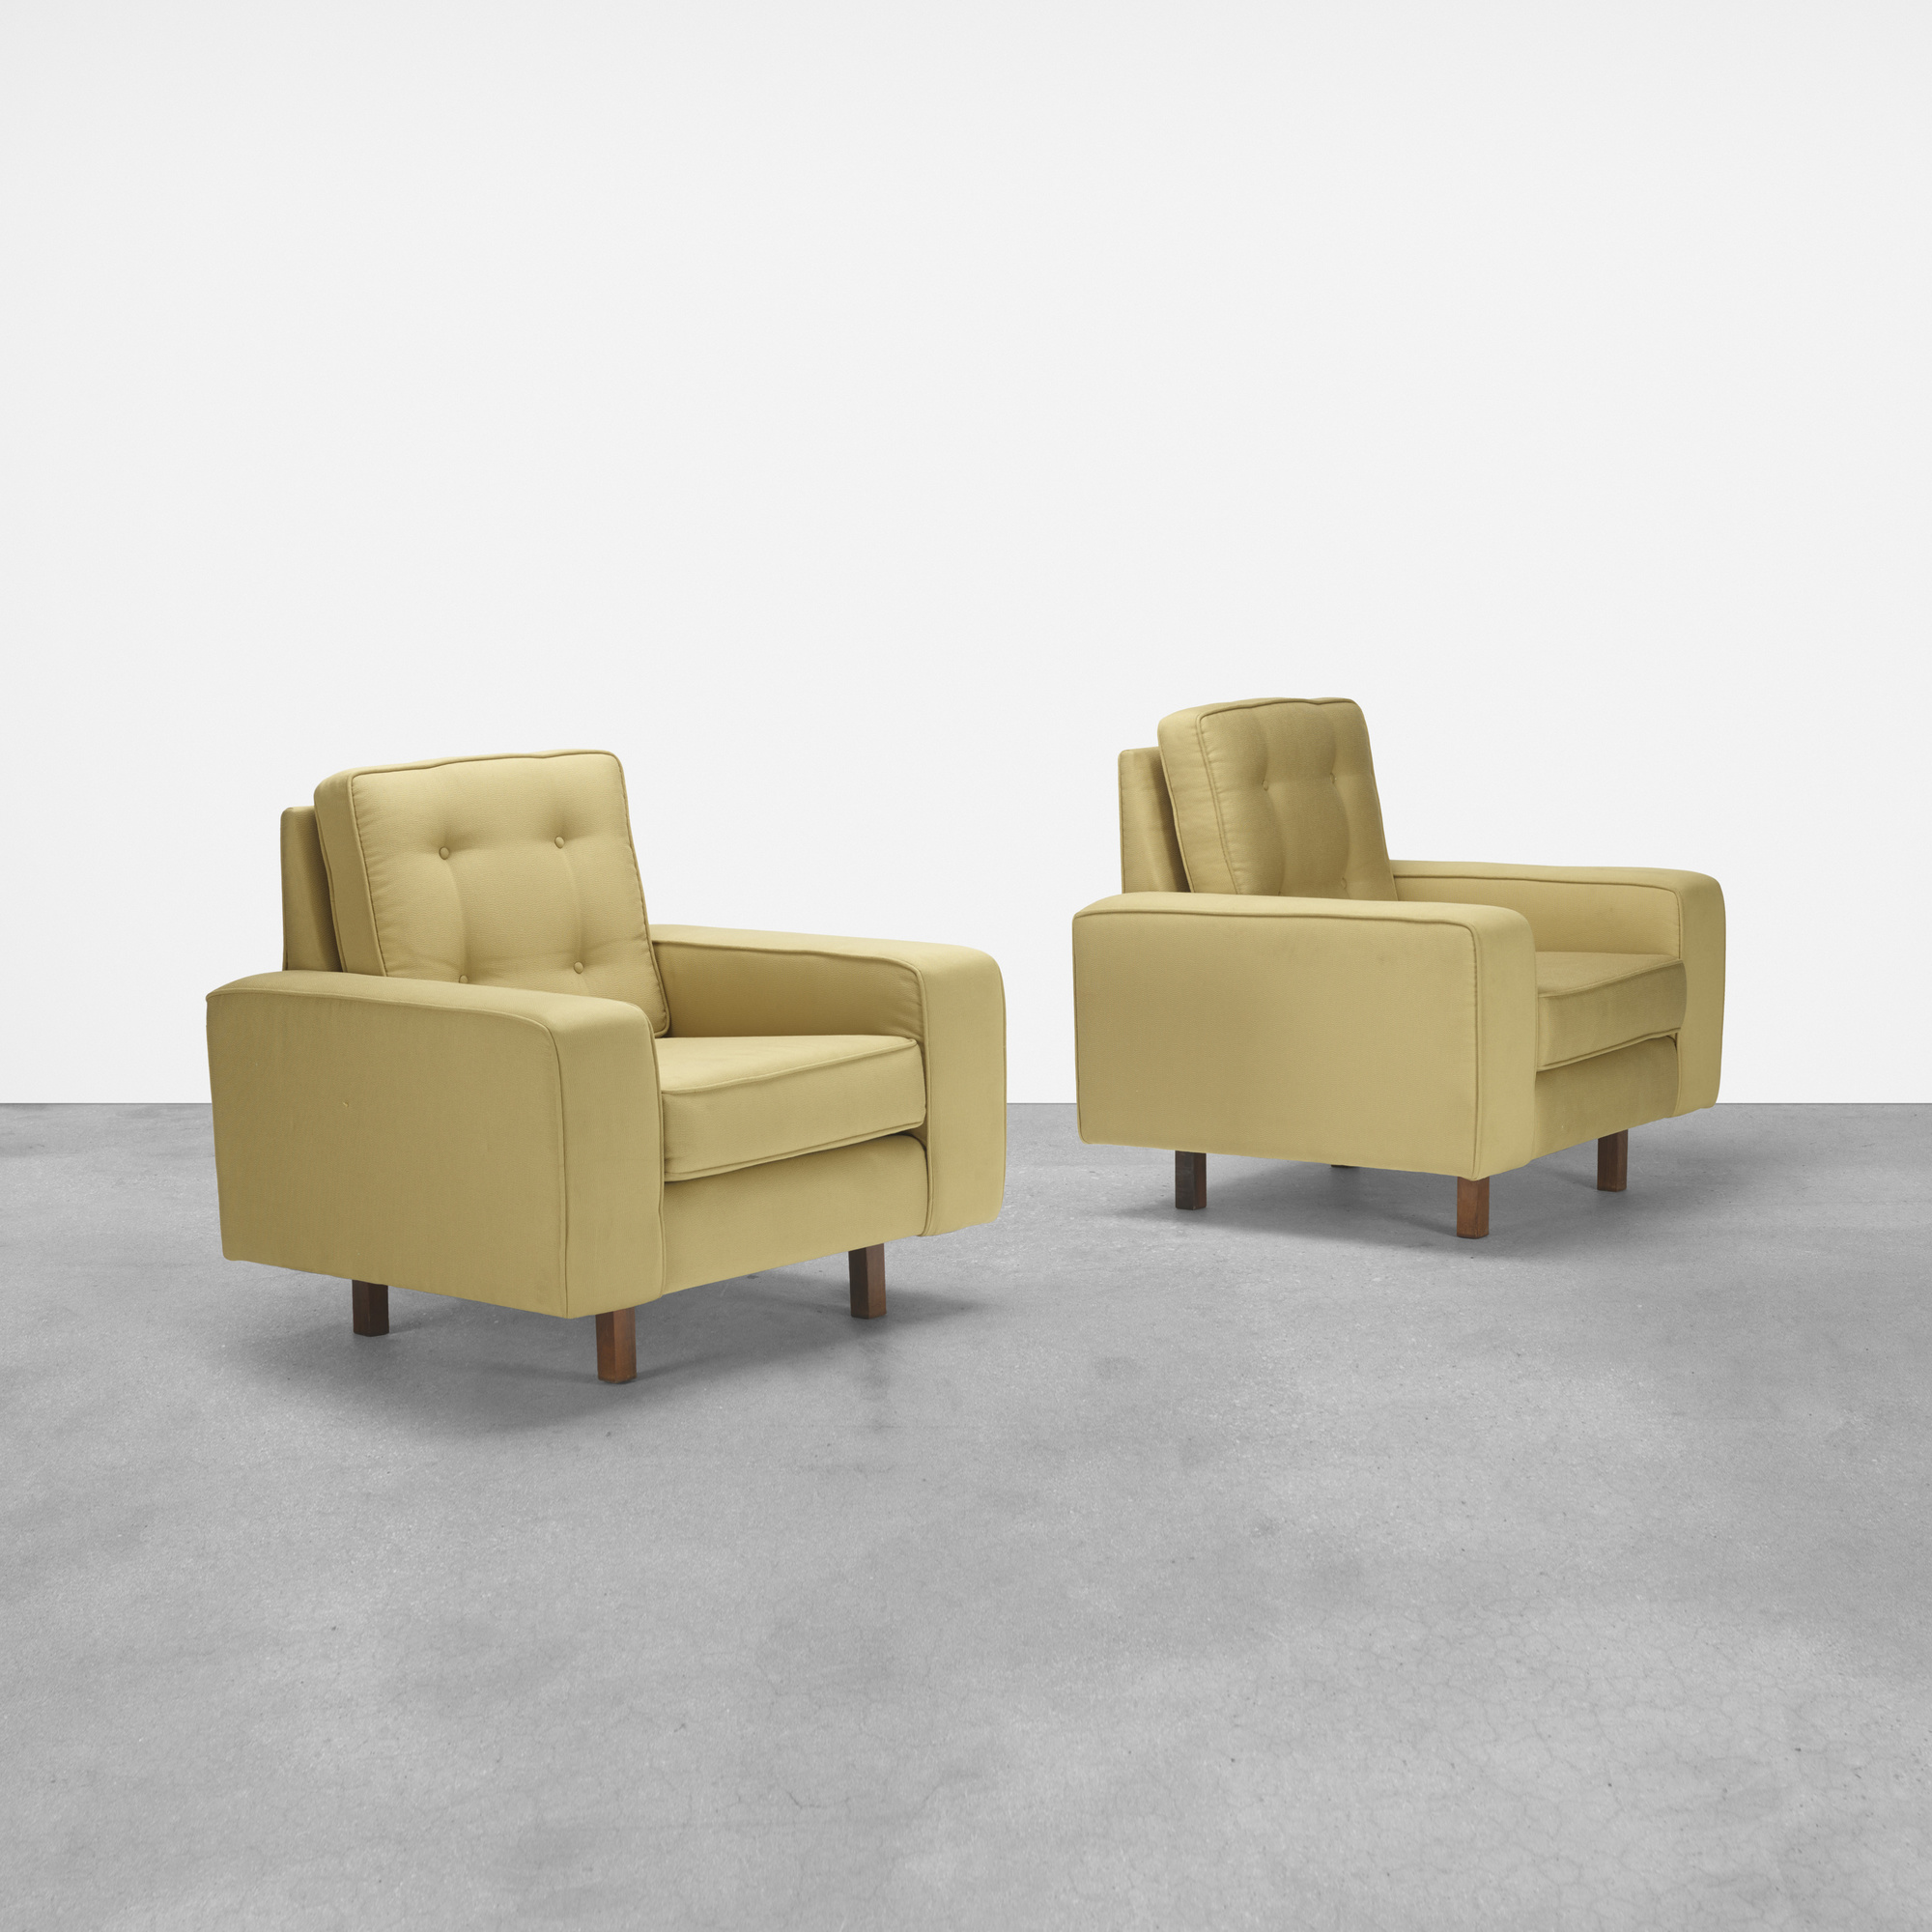 183: Joaquim Tenreiro / lounge chairs, pair (1 of 3)